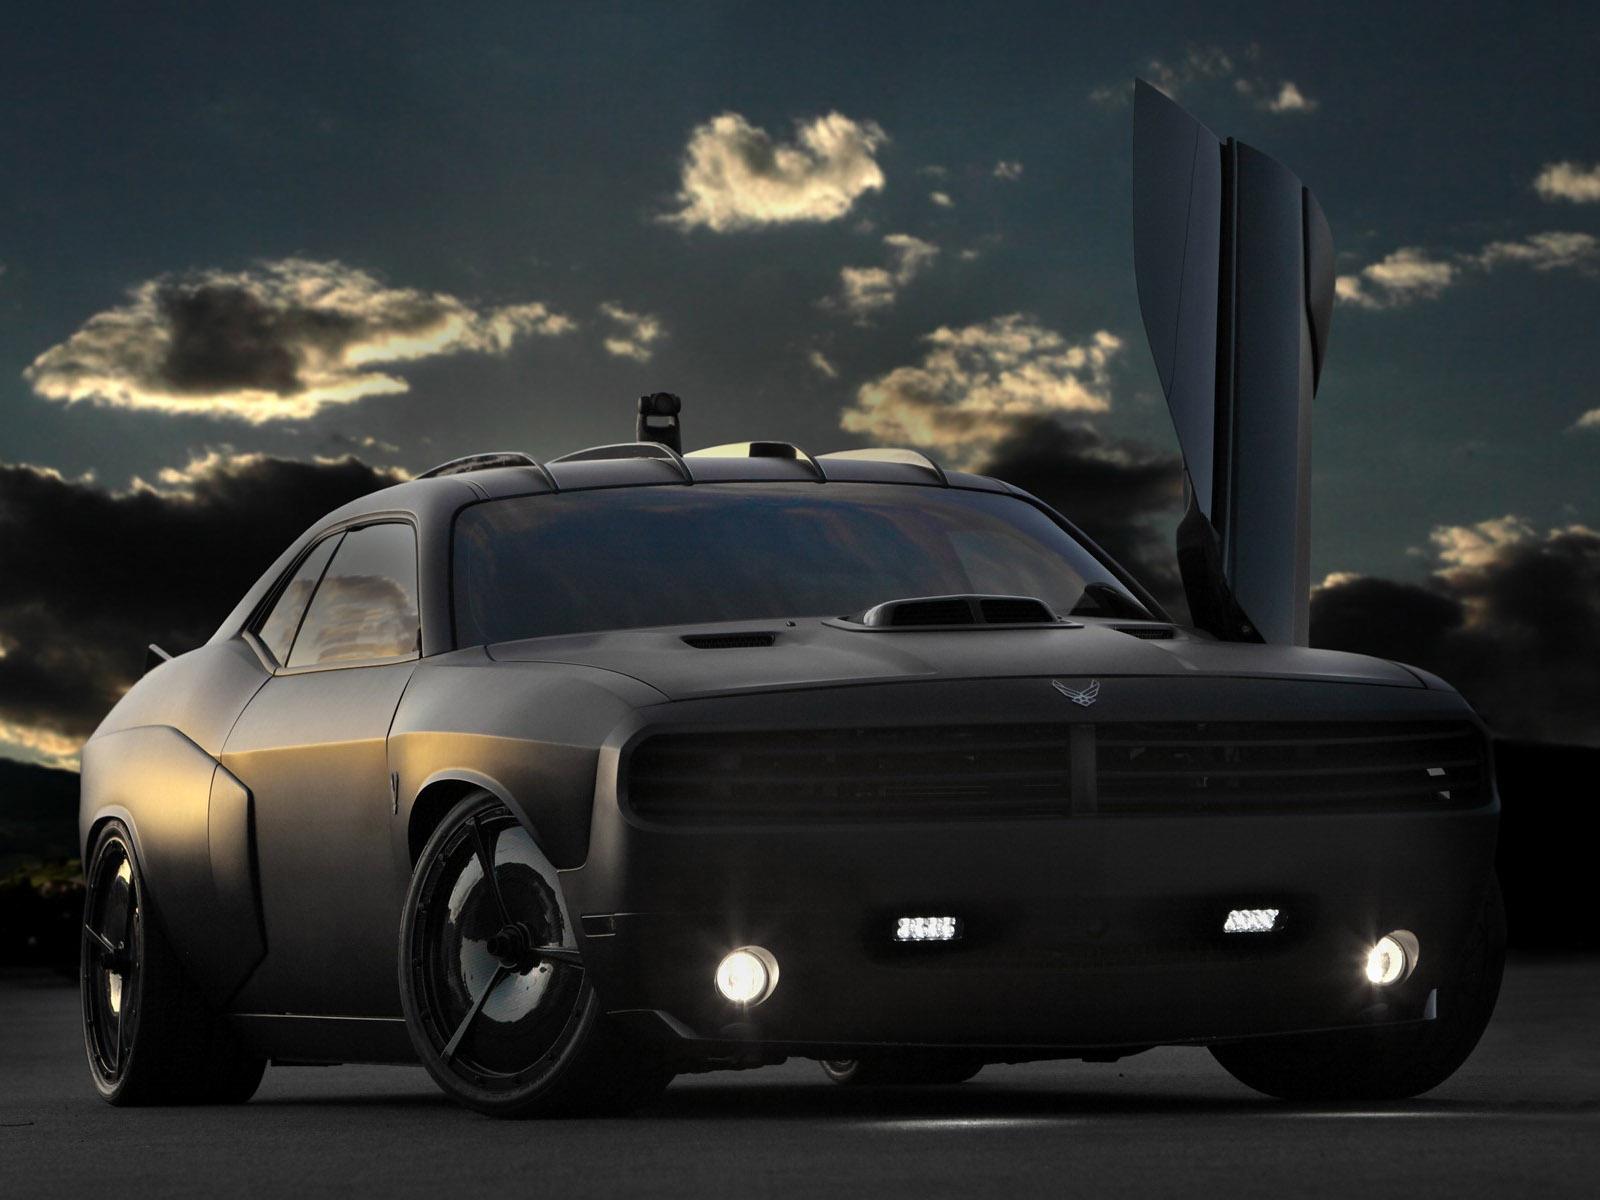 2009 Dodge Challenger Vapor Custom Concept Muscle Supercar